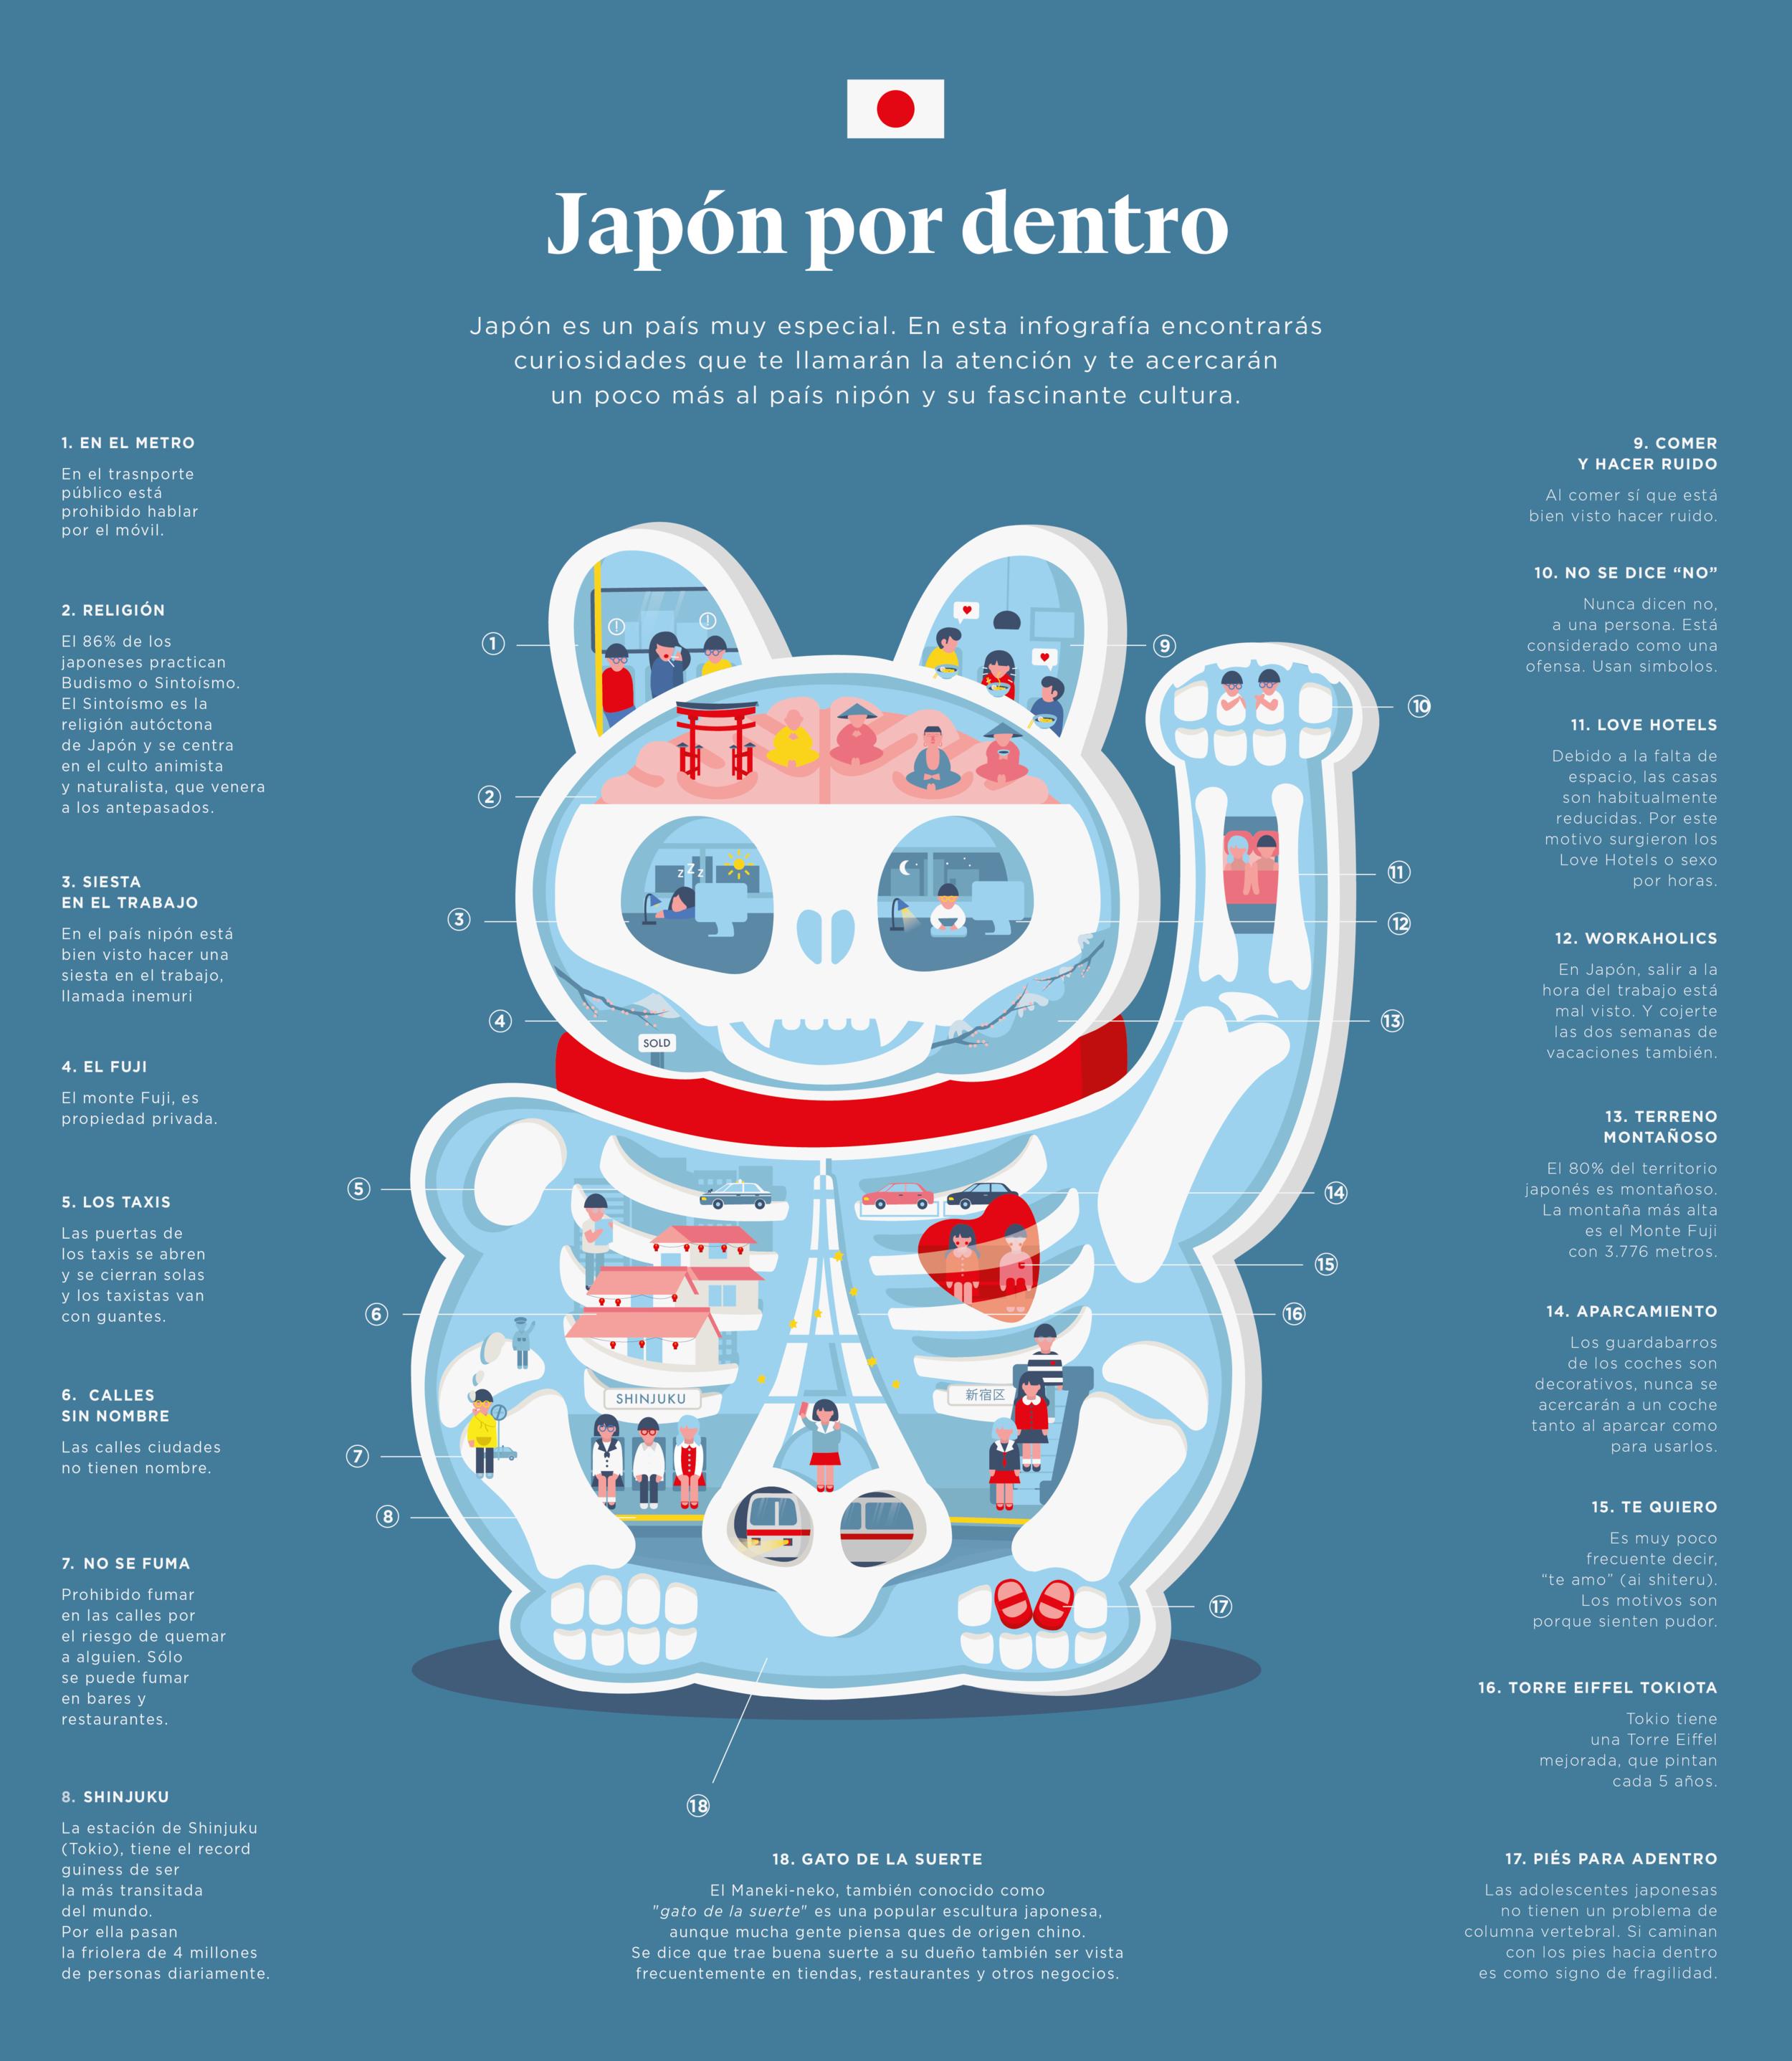 infografia_gatojapo_Mesa de trabajo 1 copia 3.png